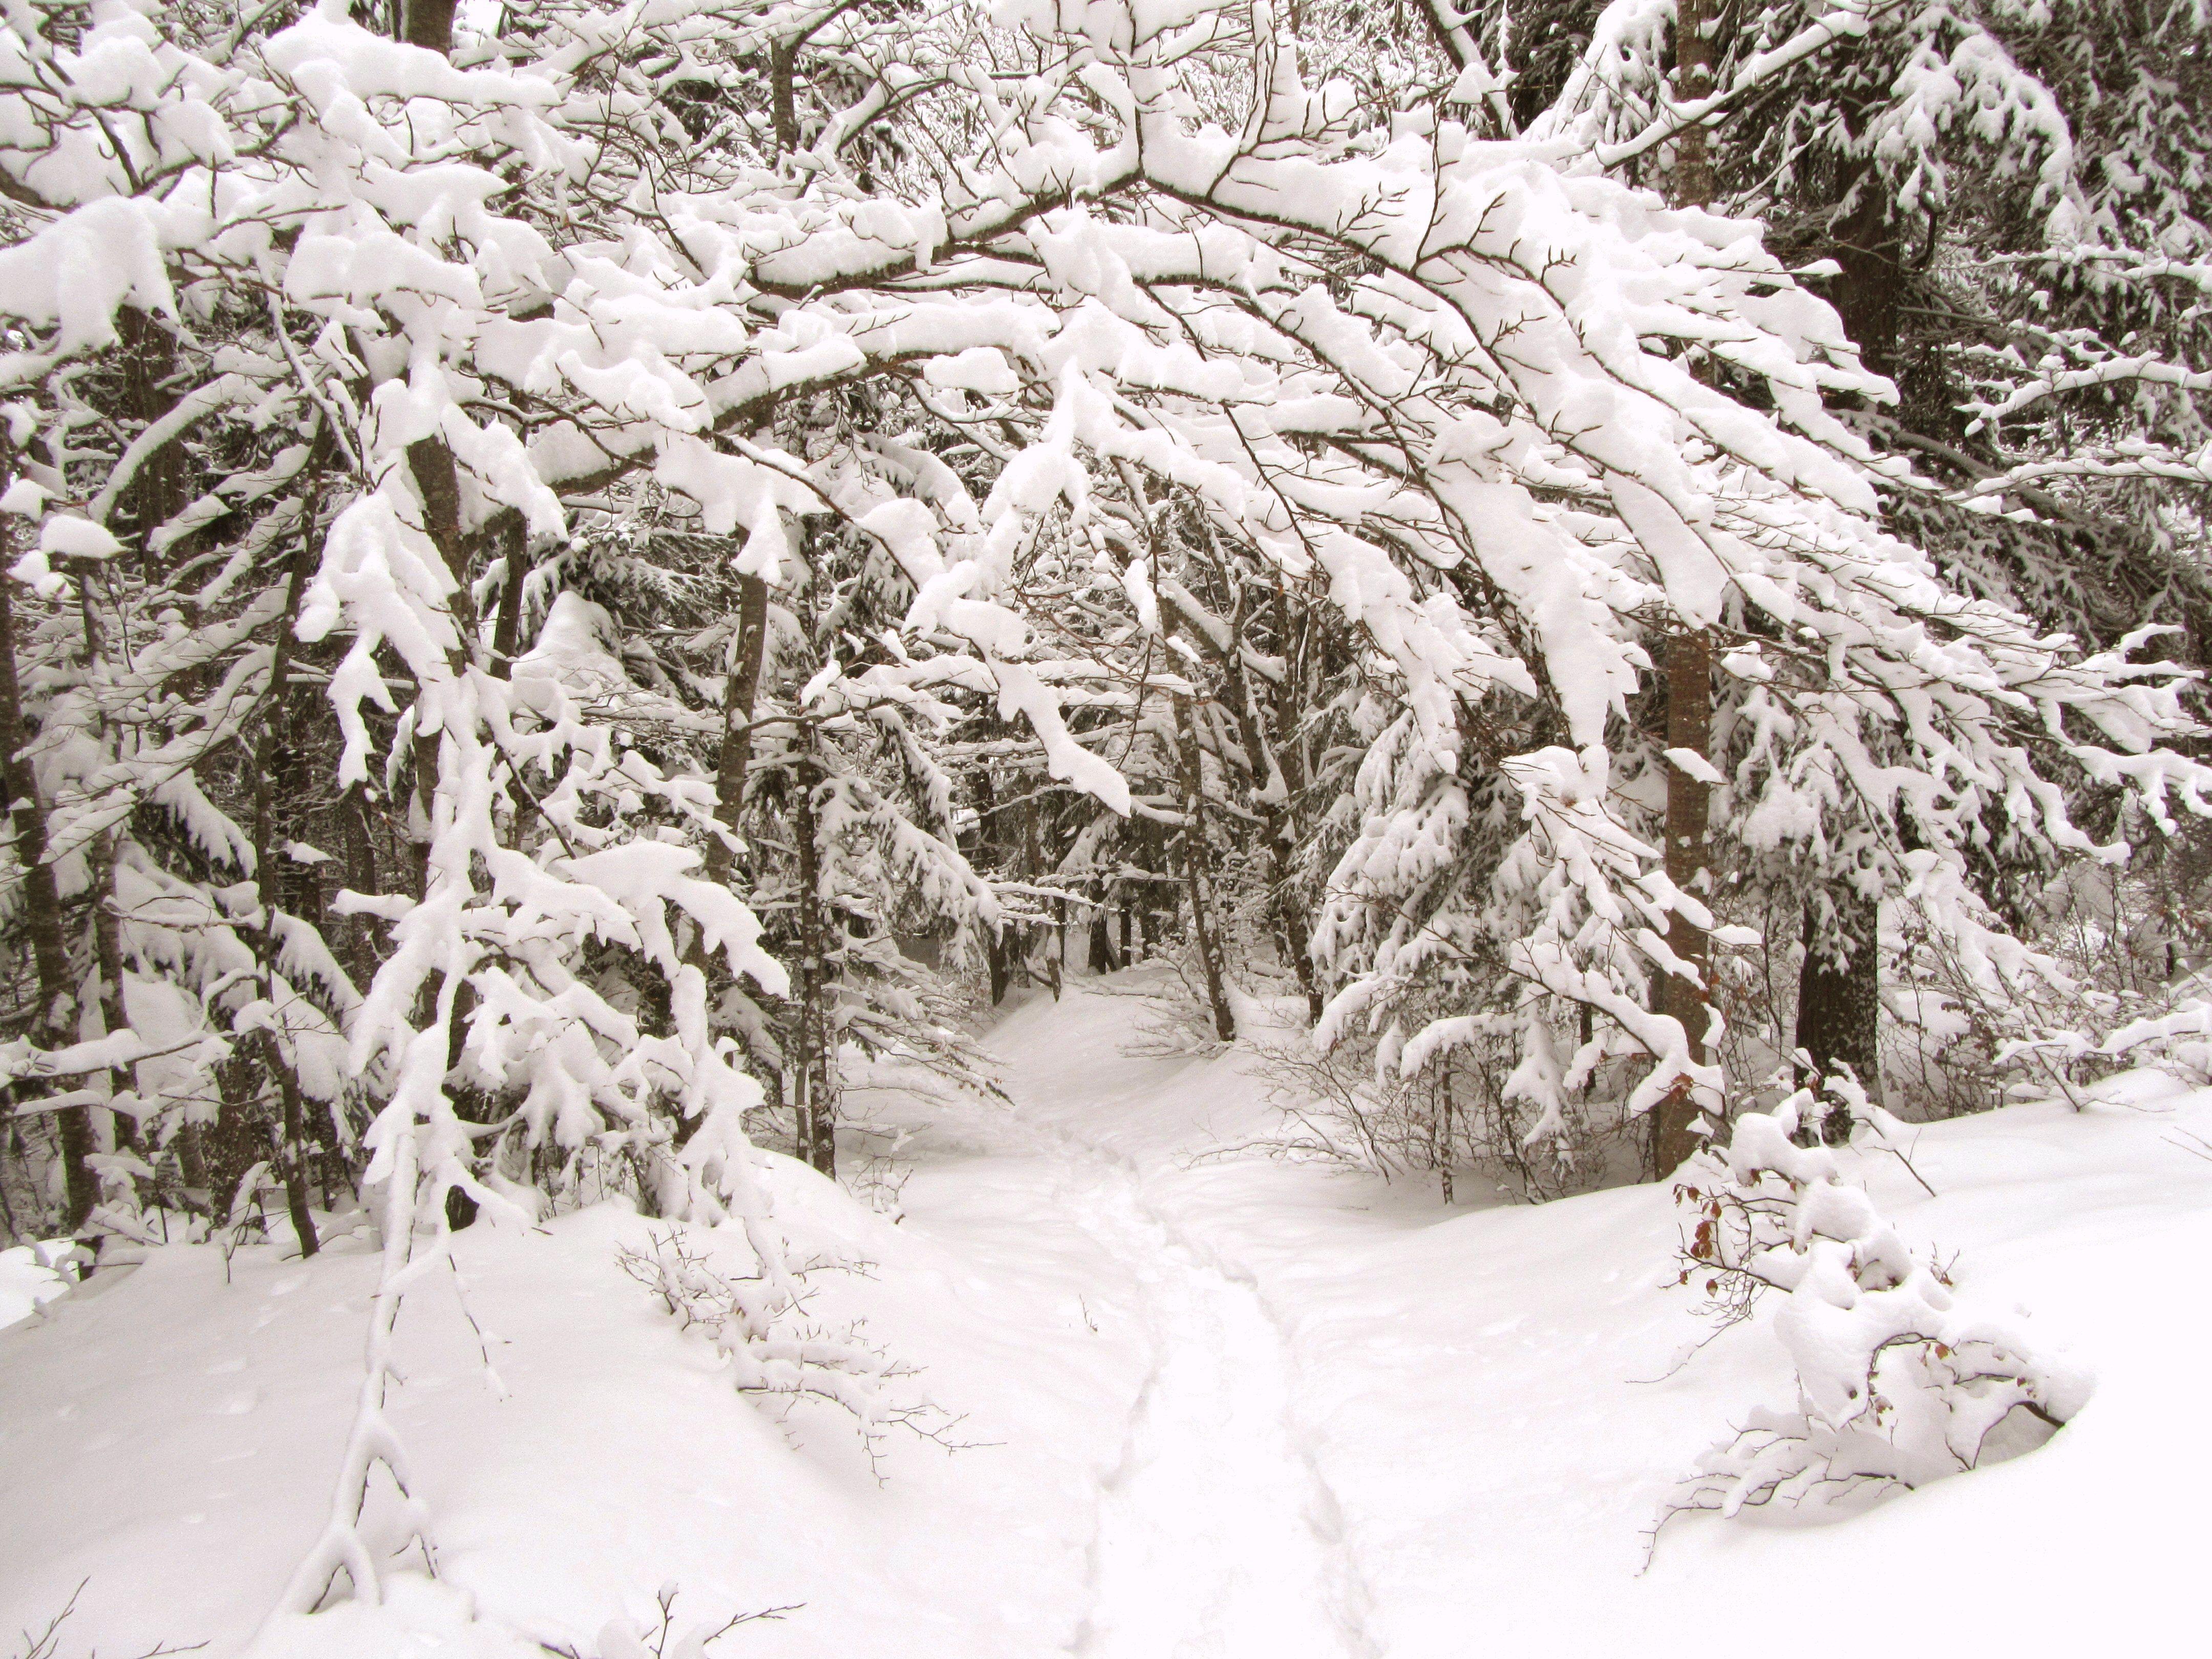 Тропинка в зимнем лесу картинки